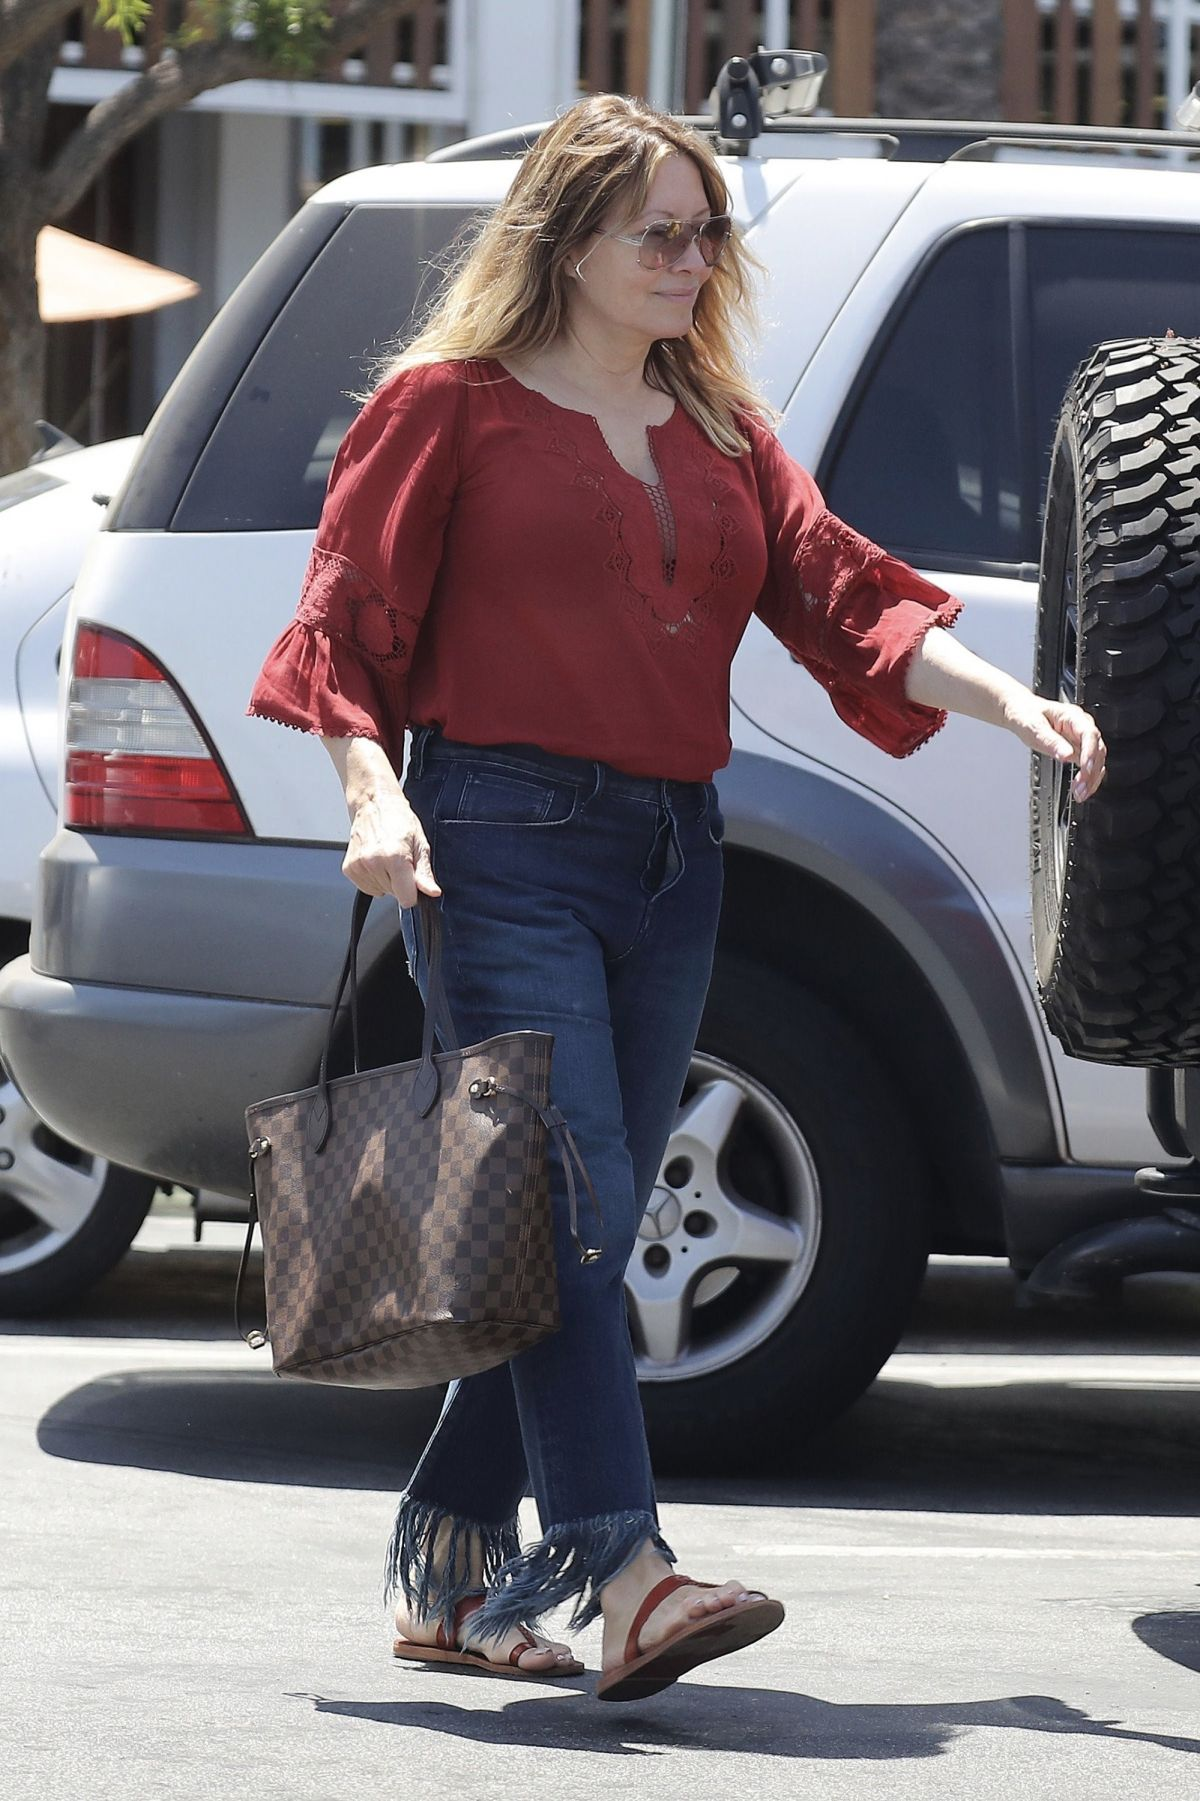 Rose McGowan (born 1973 (American actress born in Florence, Italy) Porno video Chanel Cresswell,Anna Maria Ferrero